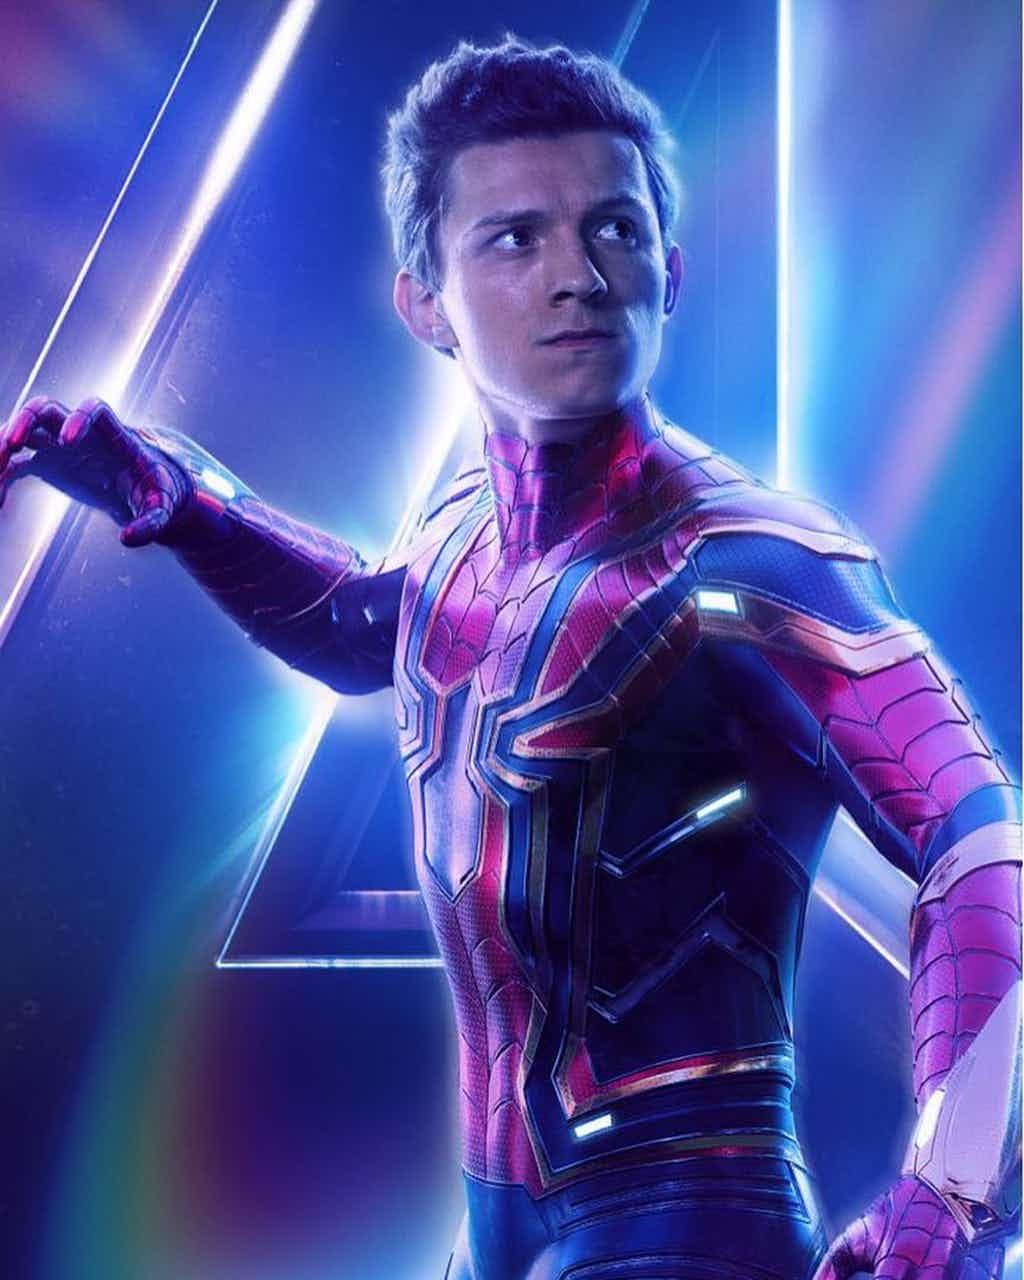 szmk_marvel_infinity_war_vegtelen_haboru_bosszuallok_avengers_ironman_hulk_thor_captainamaerica_guardians_galaxy_9.jpg